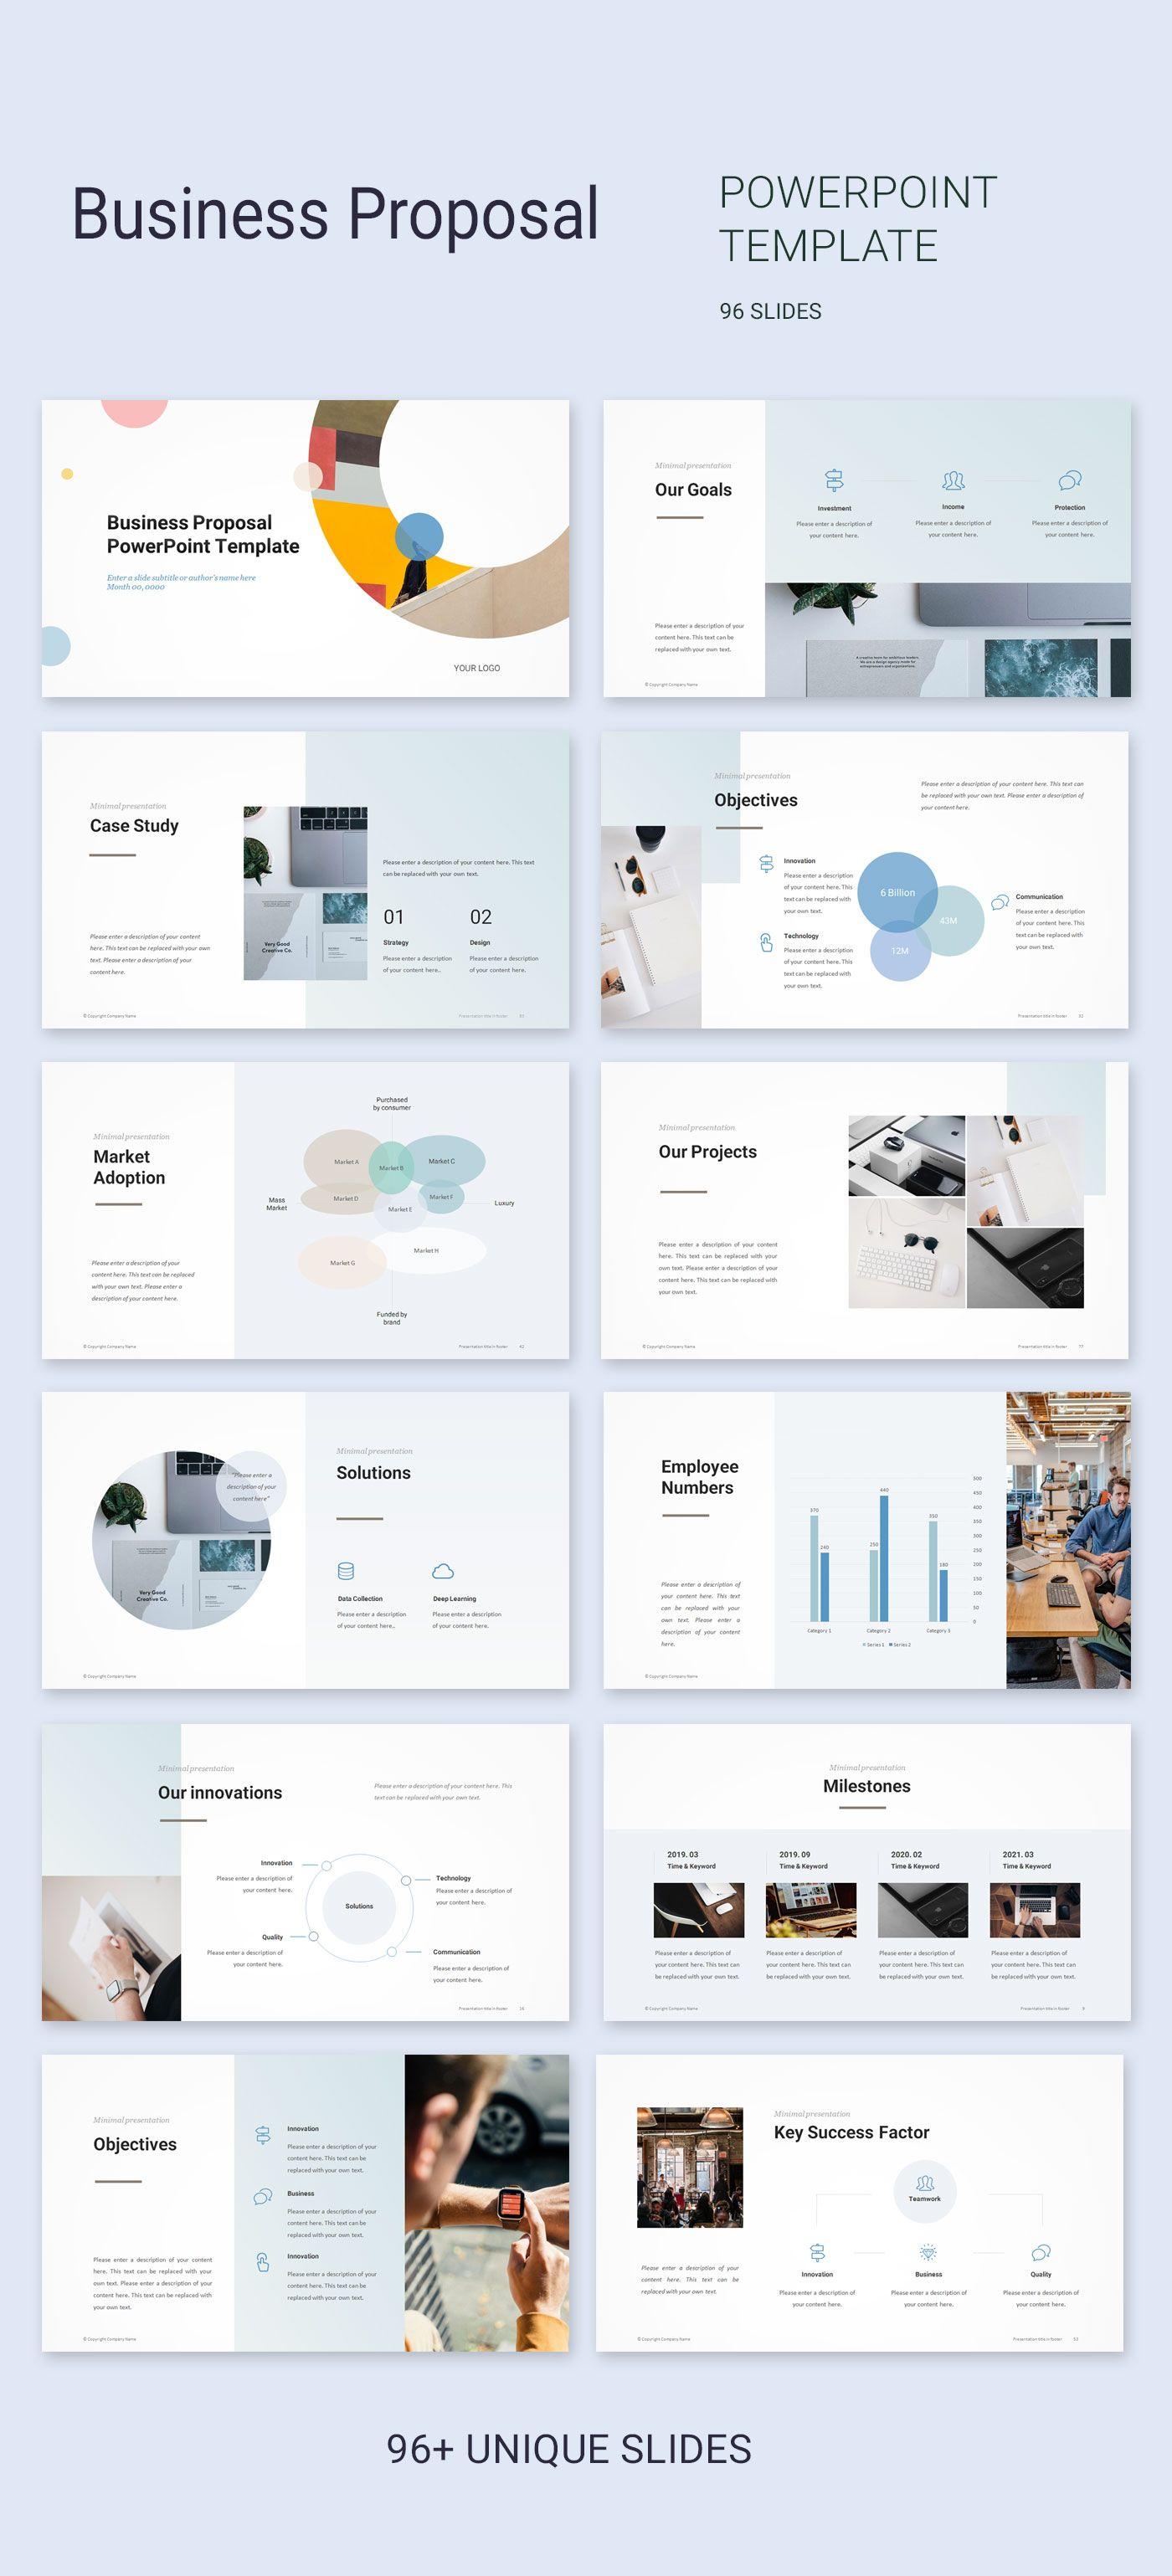 Business Proposal Powerpoint Template Powerpoint Presentation Design Ppt Template Design Presentation Design Layout